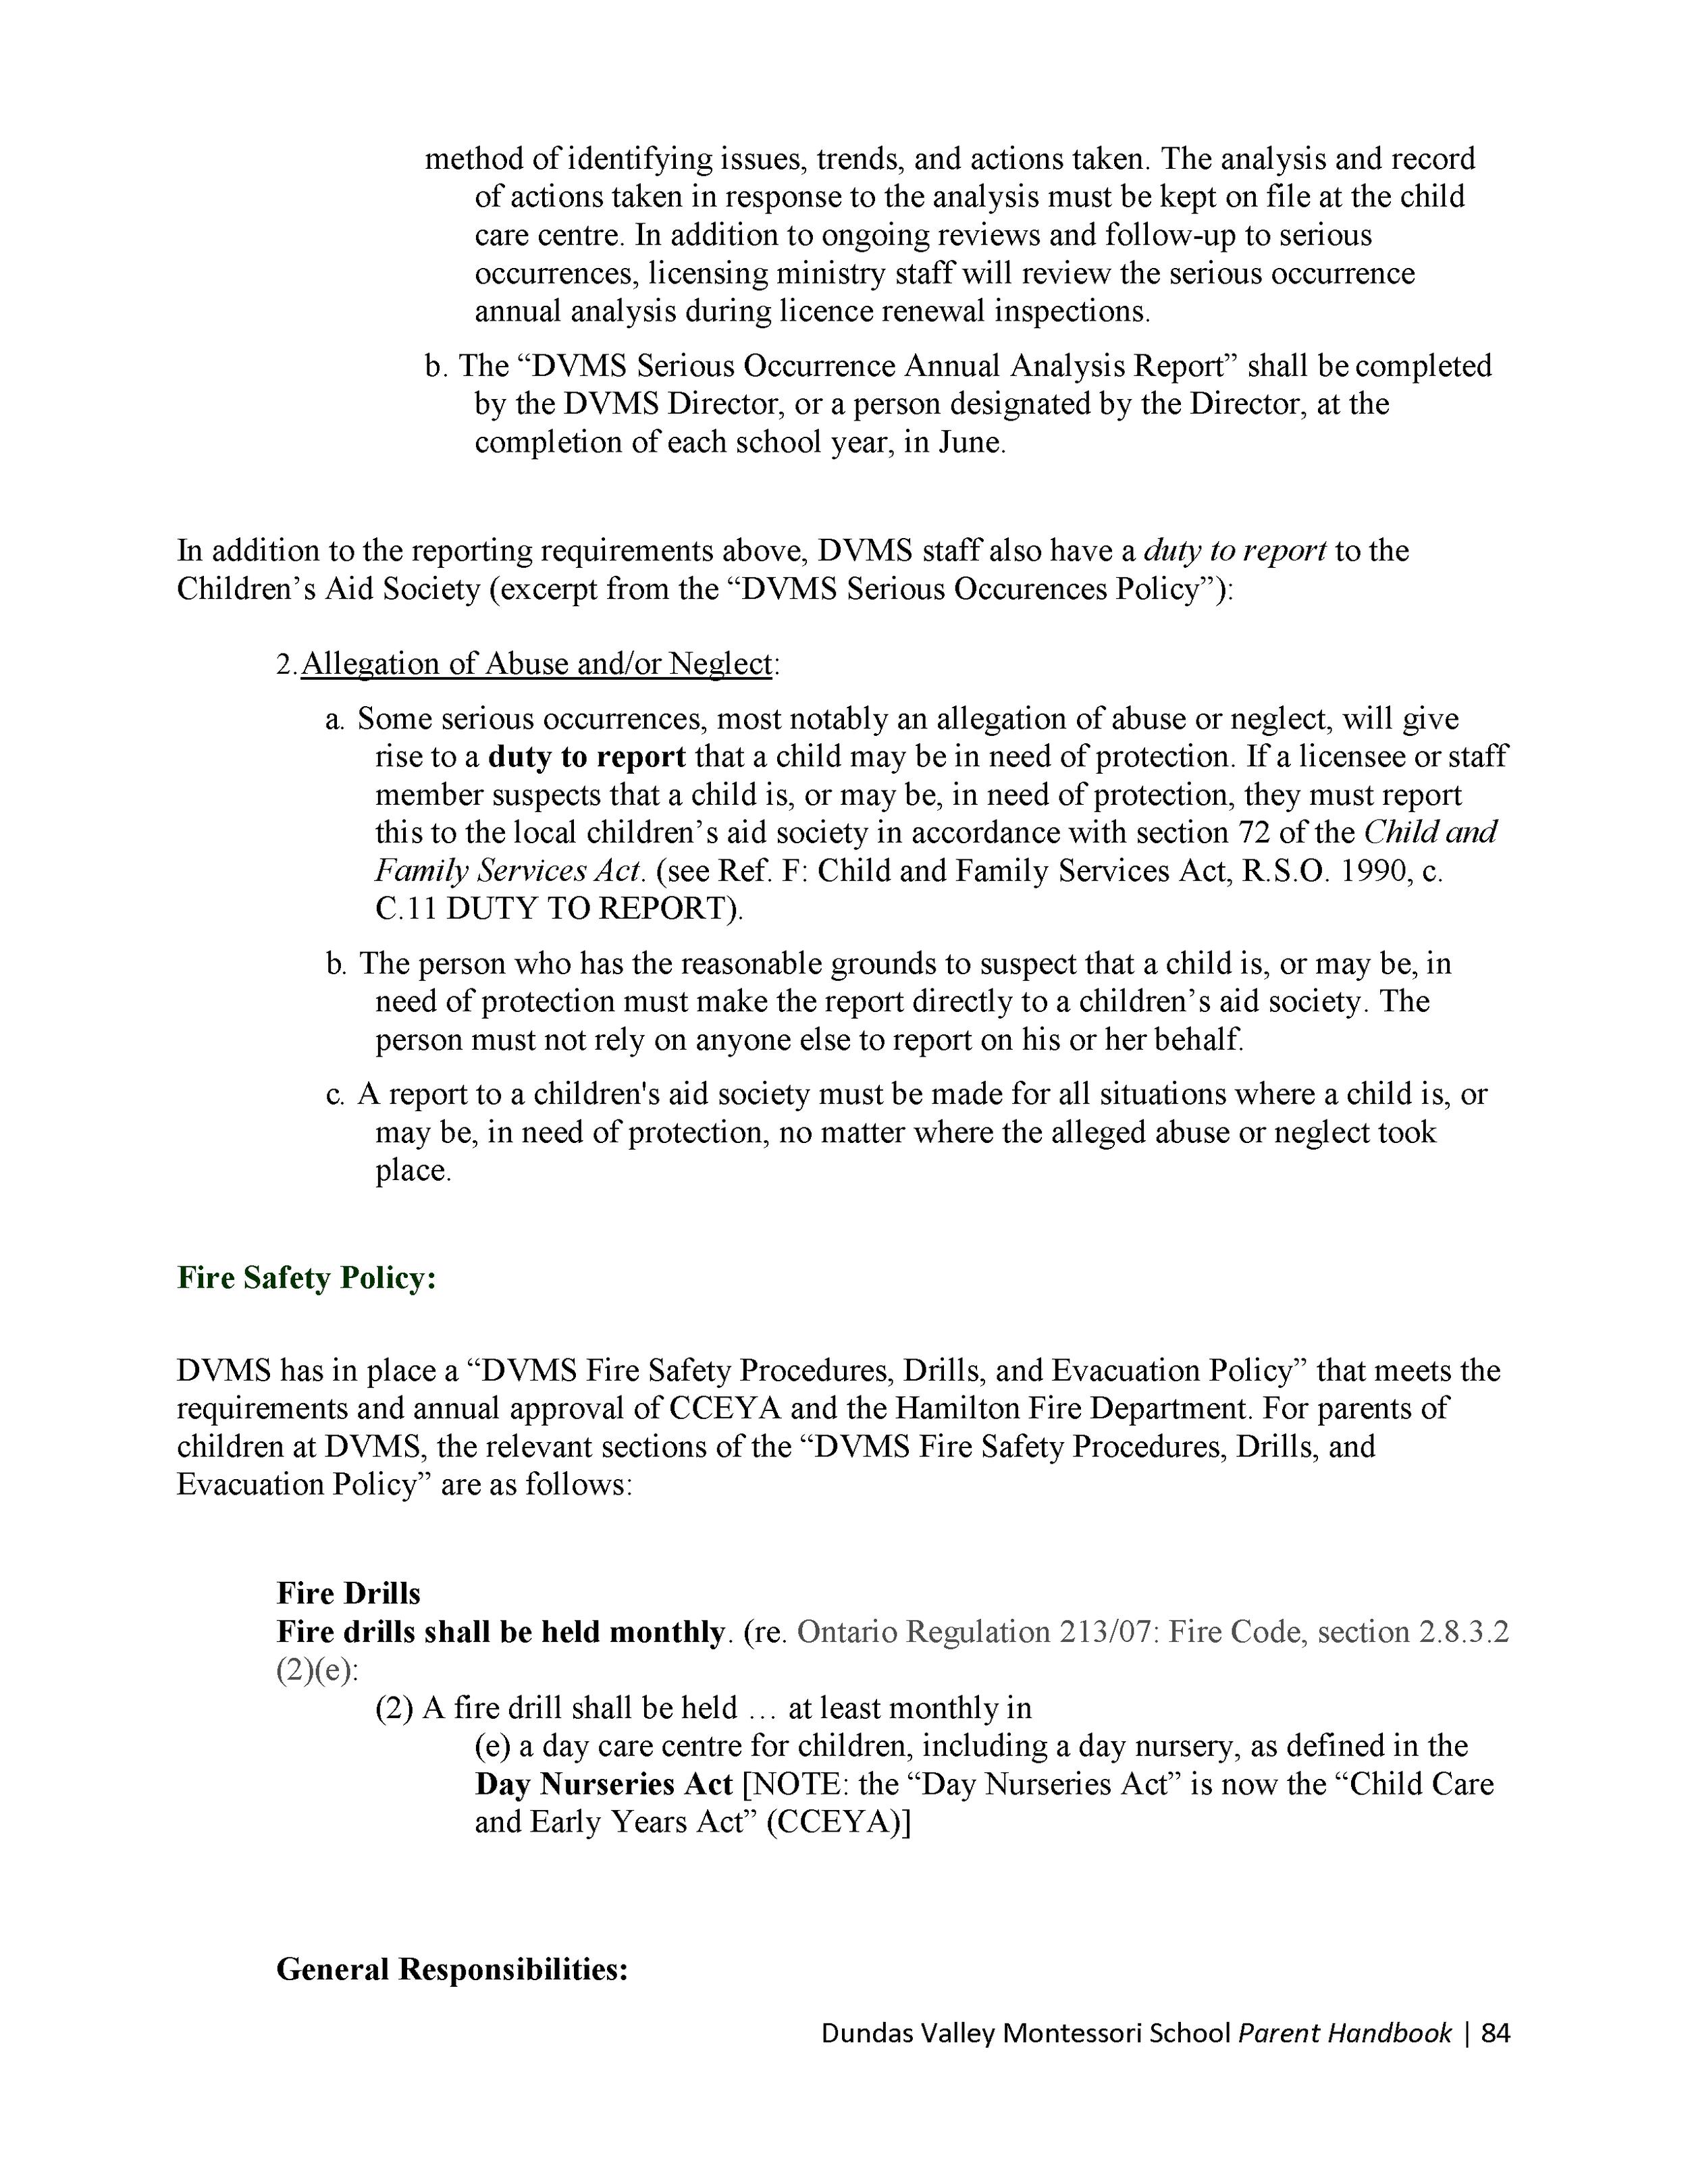 DVMS-Parent-Handbook-19-20_Page_086.png